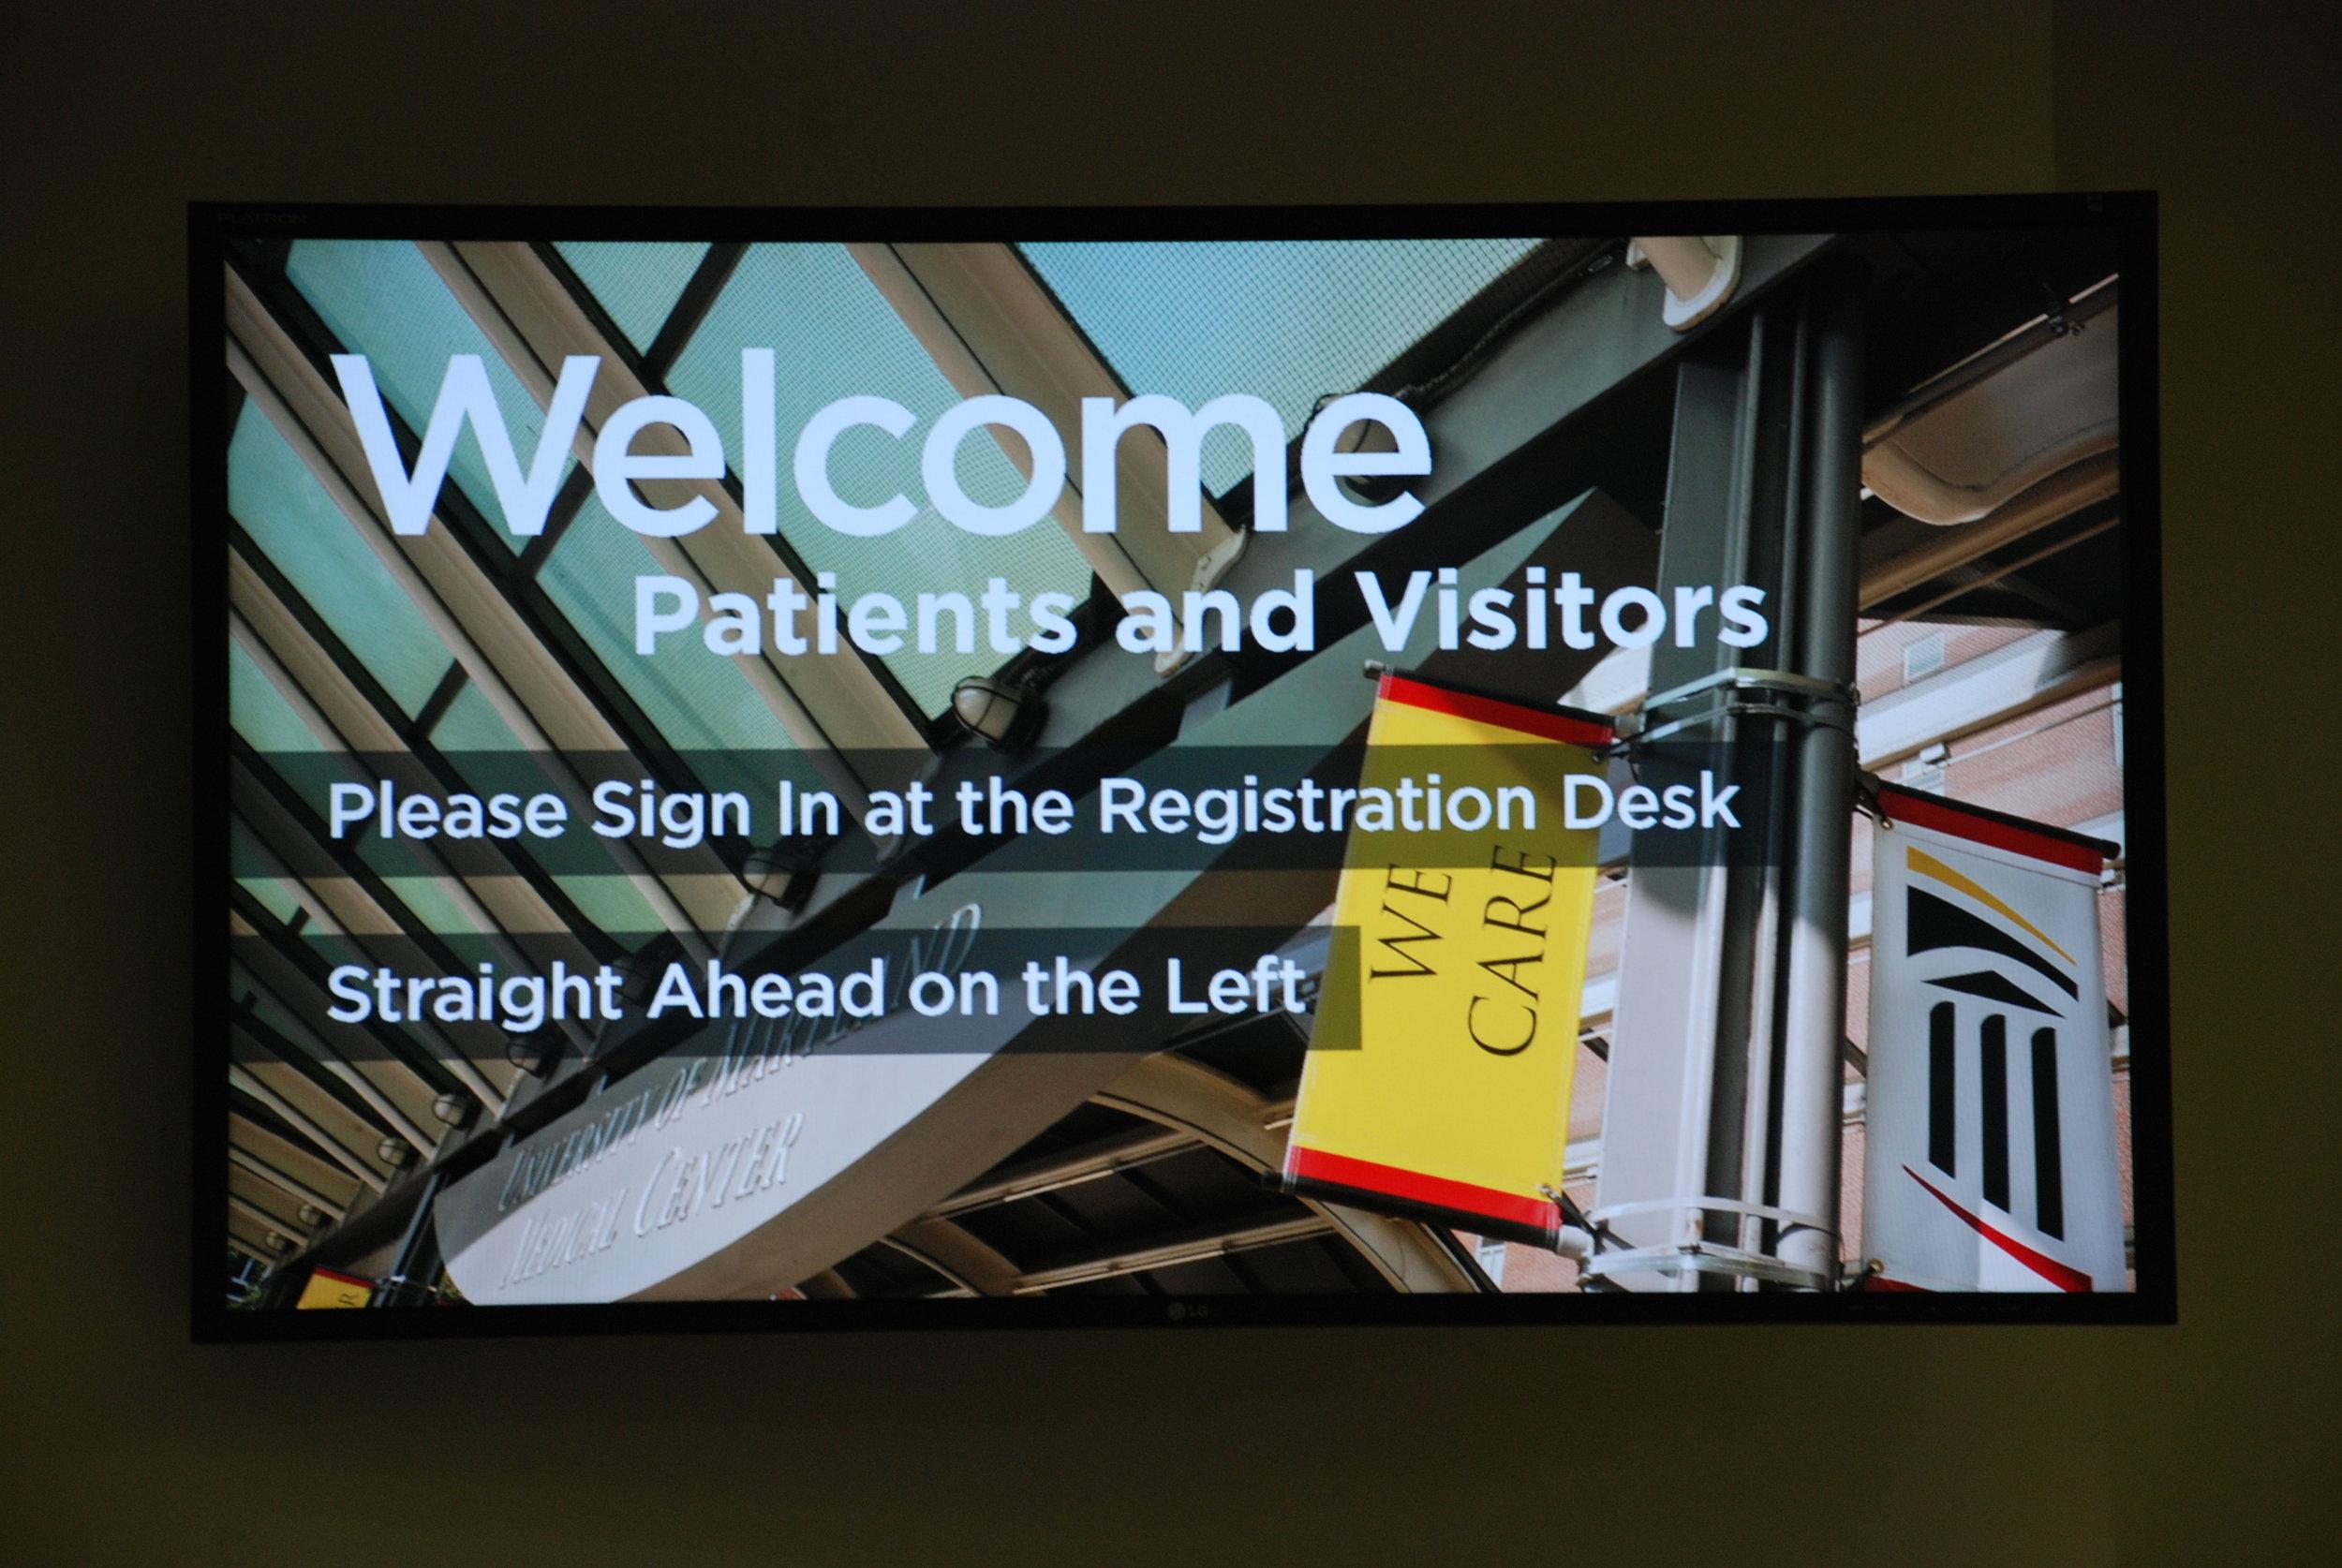 ummc digital signage install 8-2011 (19).jpg